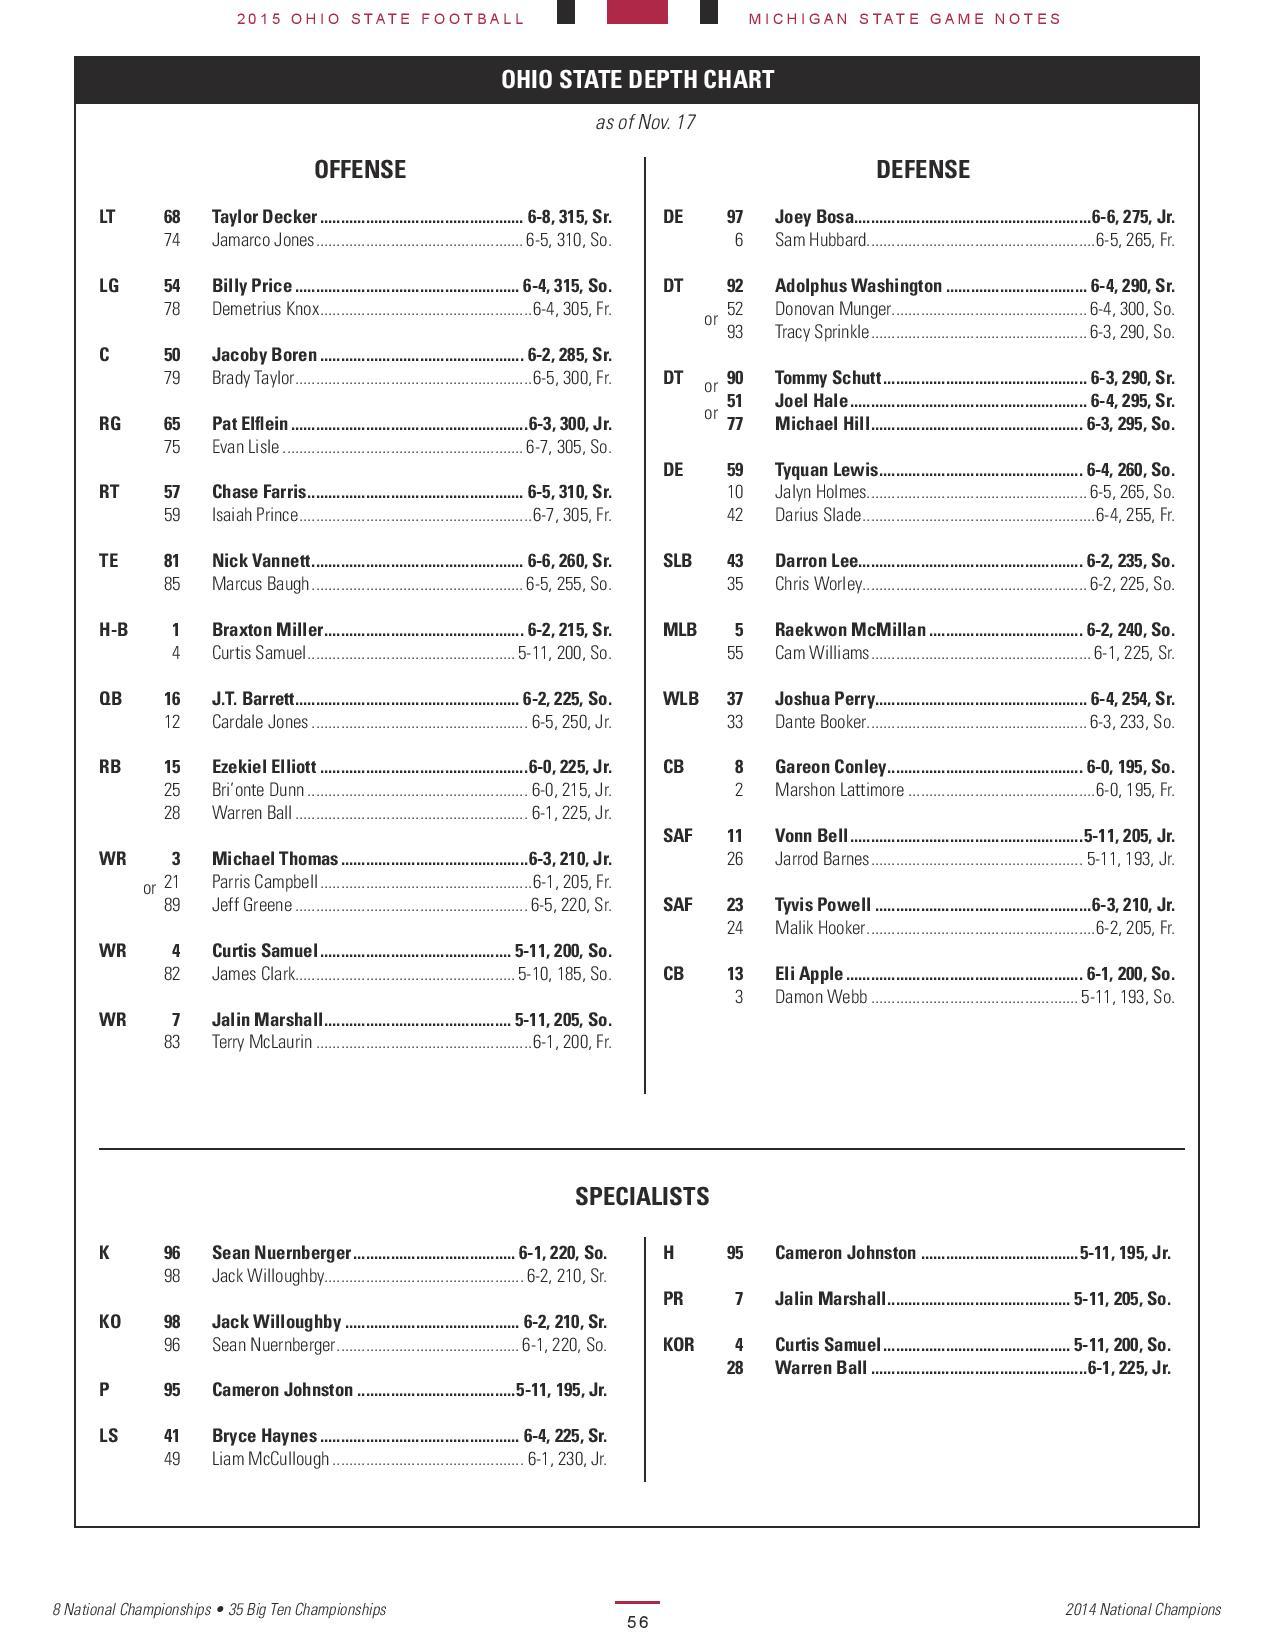 michigan state football depth chart 2016